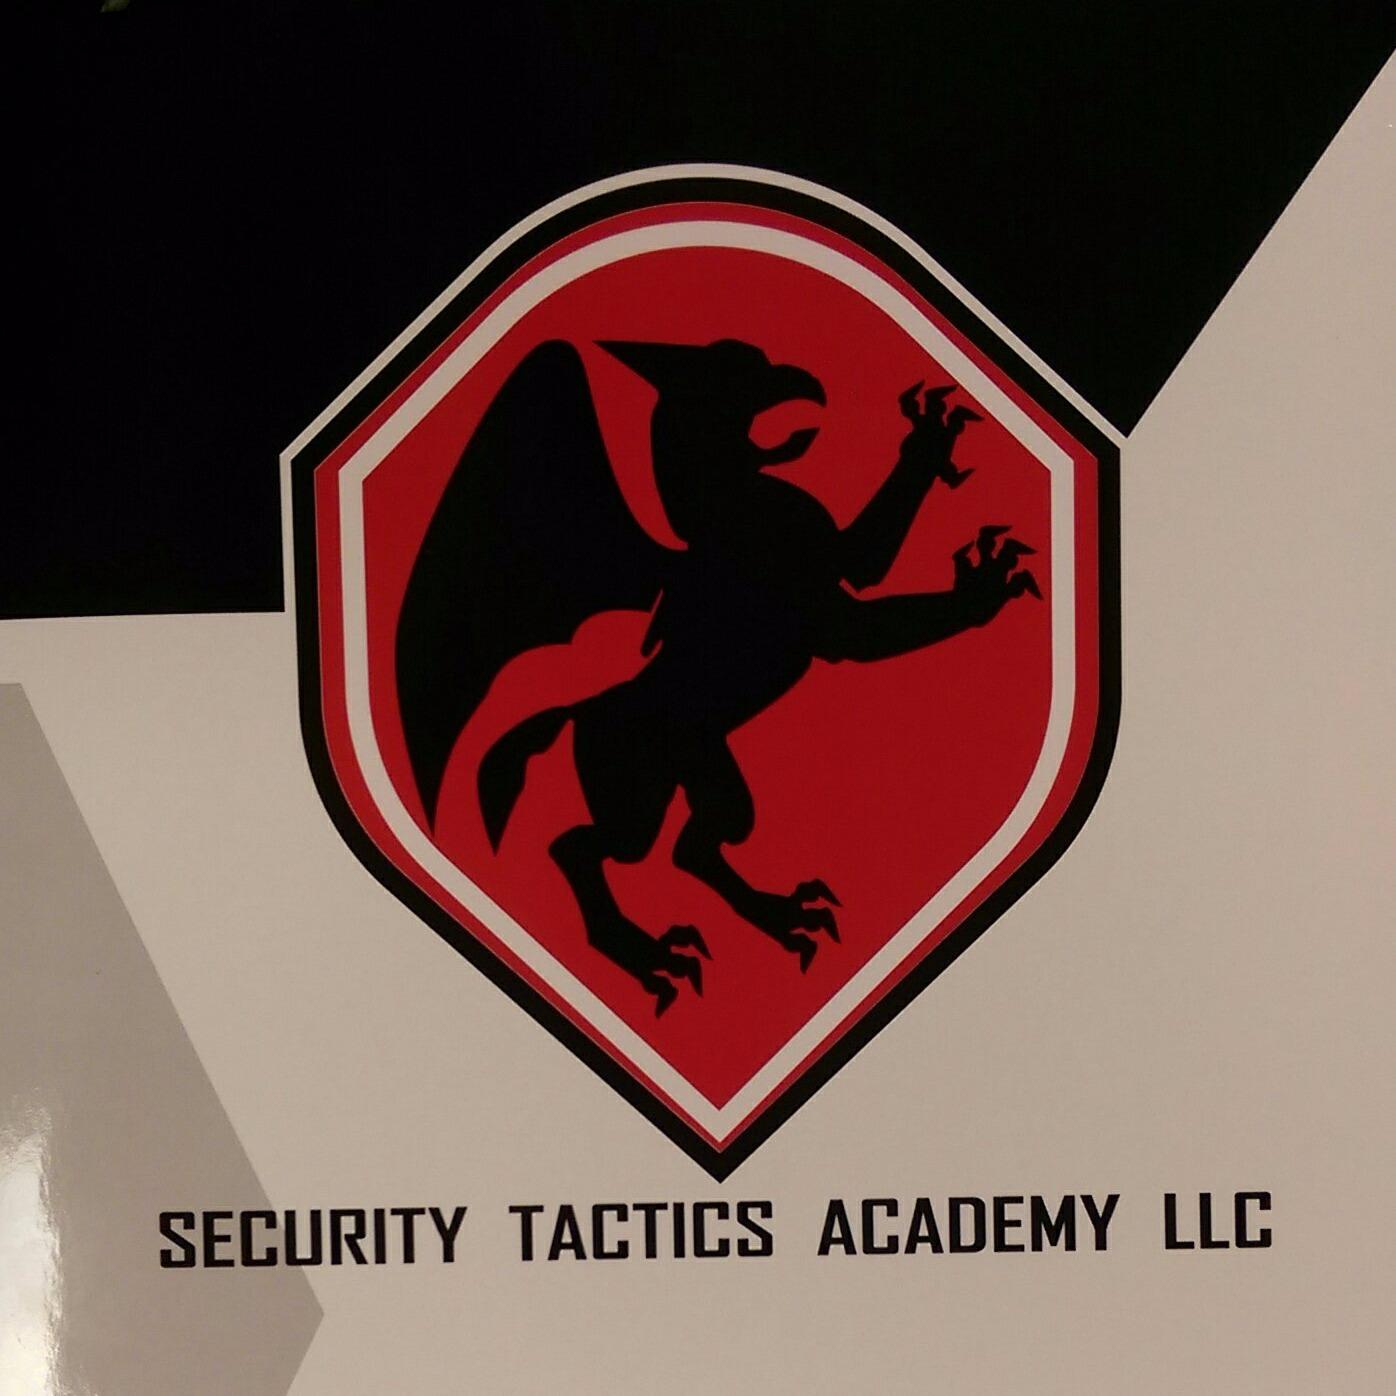 Security Tactics Academy